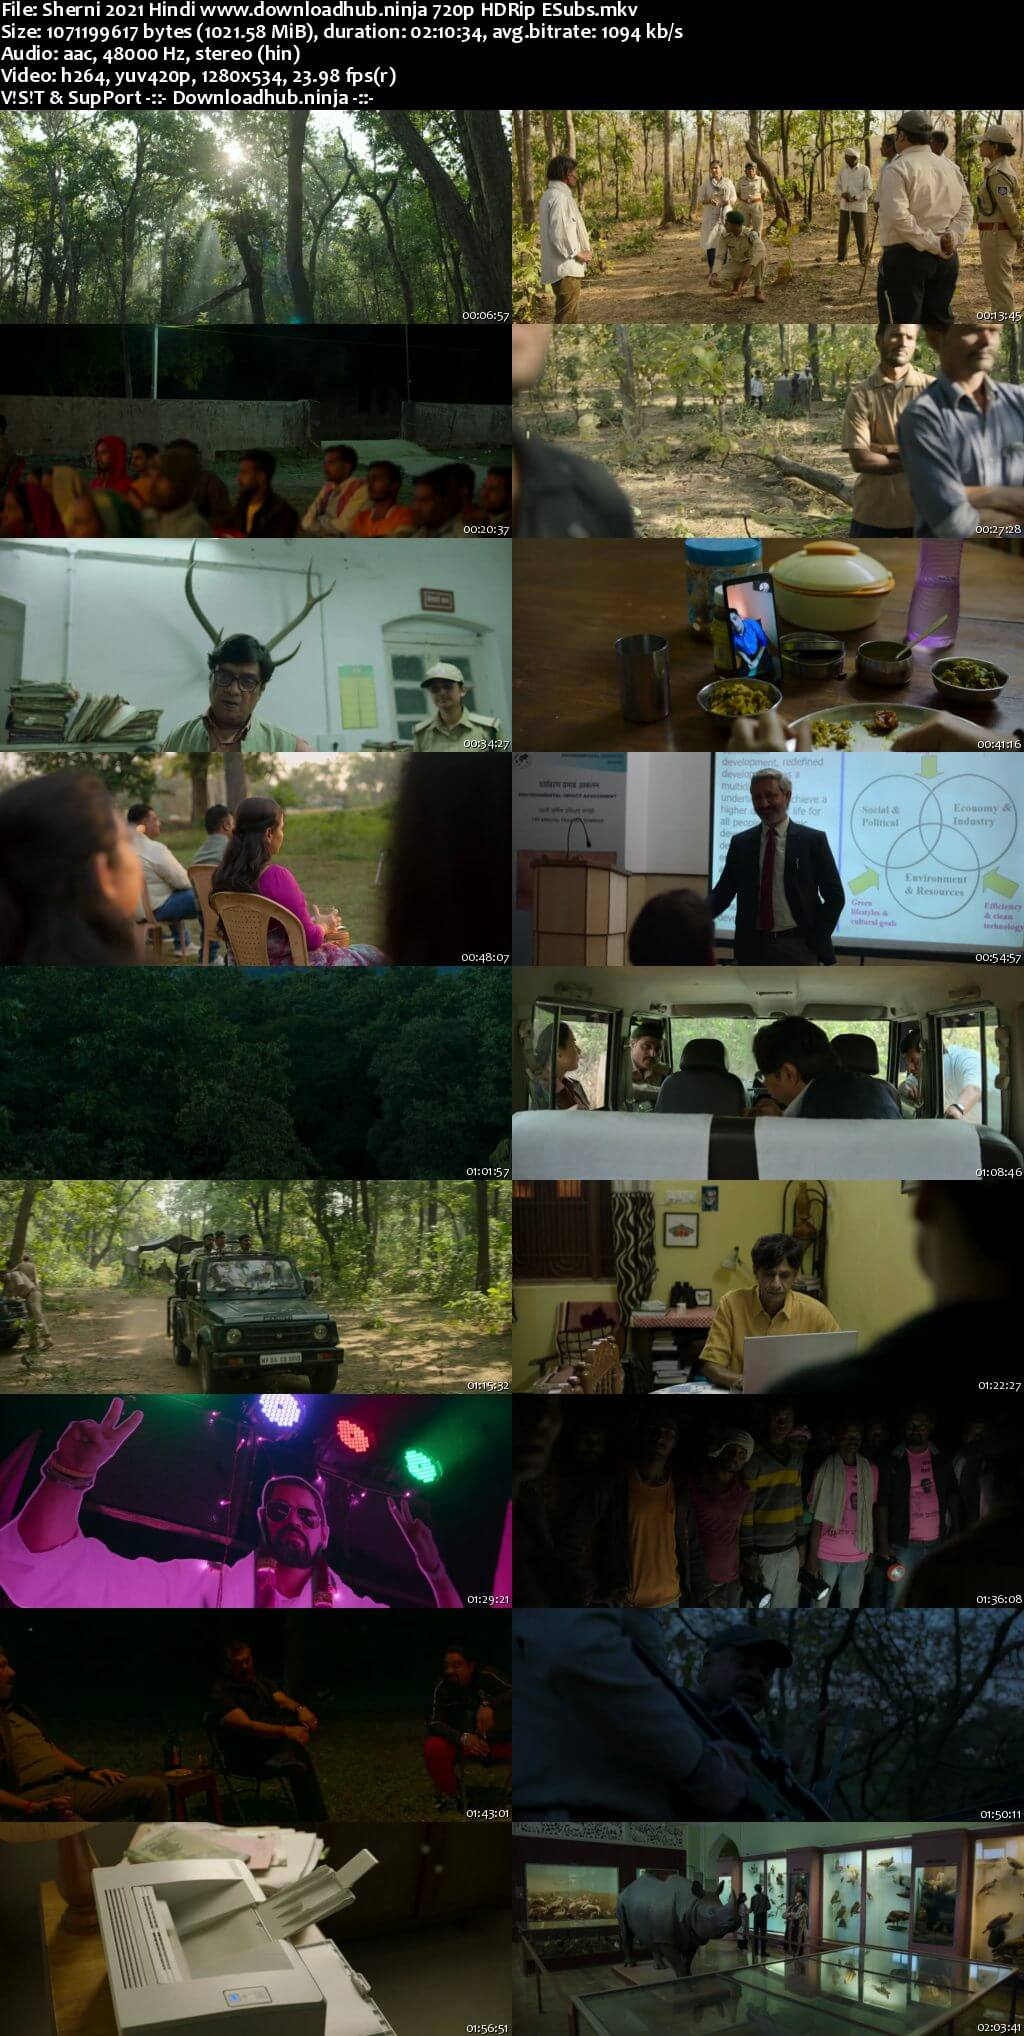 Sherni 2021 Hindi 720p HDRip ESubs